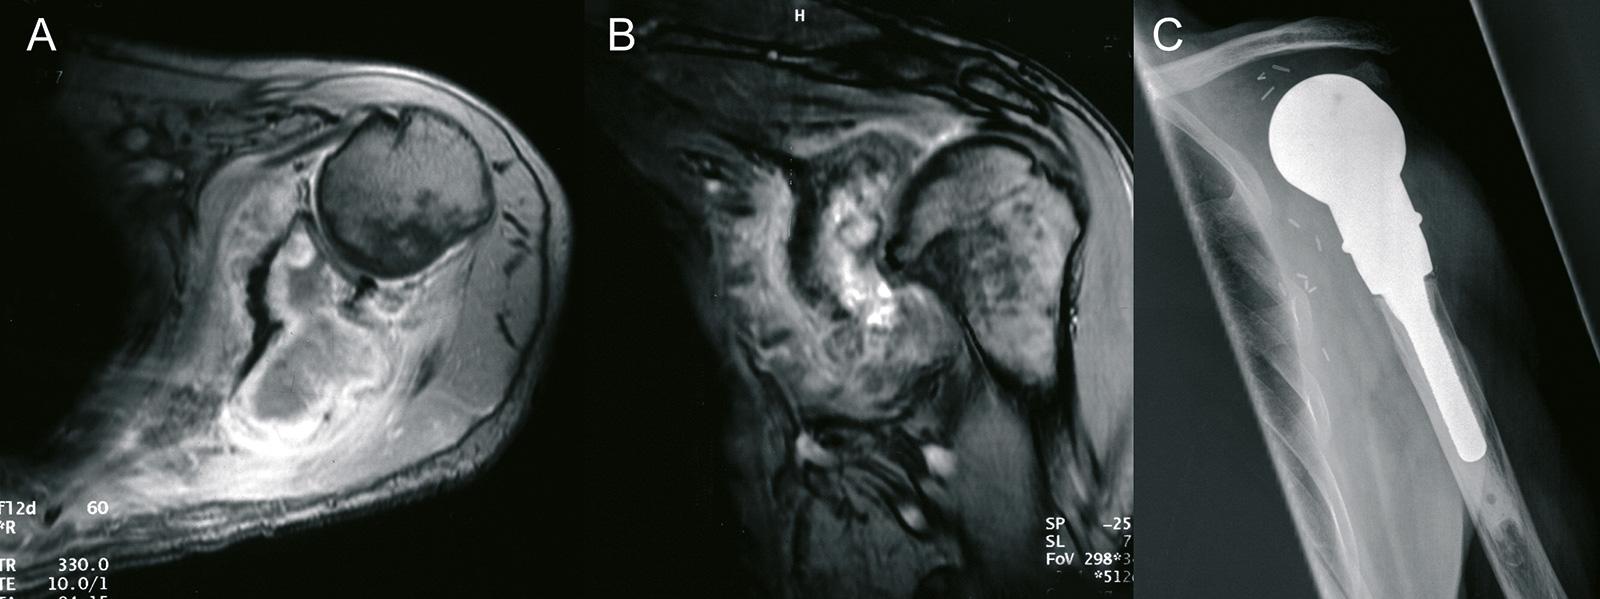 Abb. 8-9: Tikhoff Linberg Operation (C) nach exraartikulärer Resektion eines Osteosarkoms (A-B)